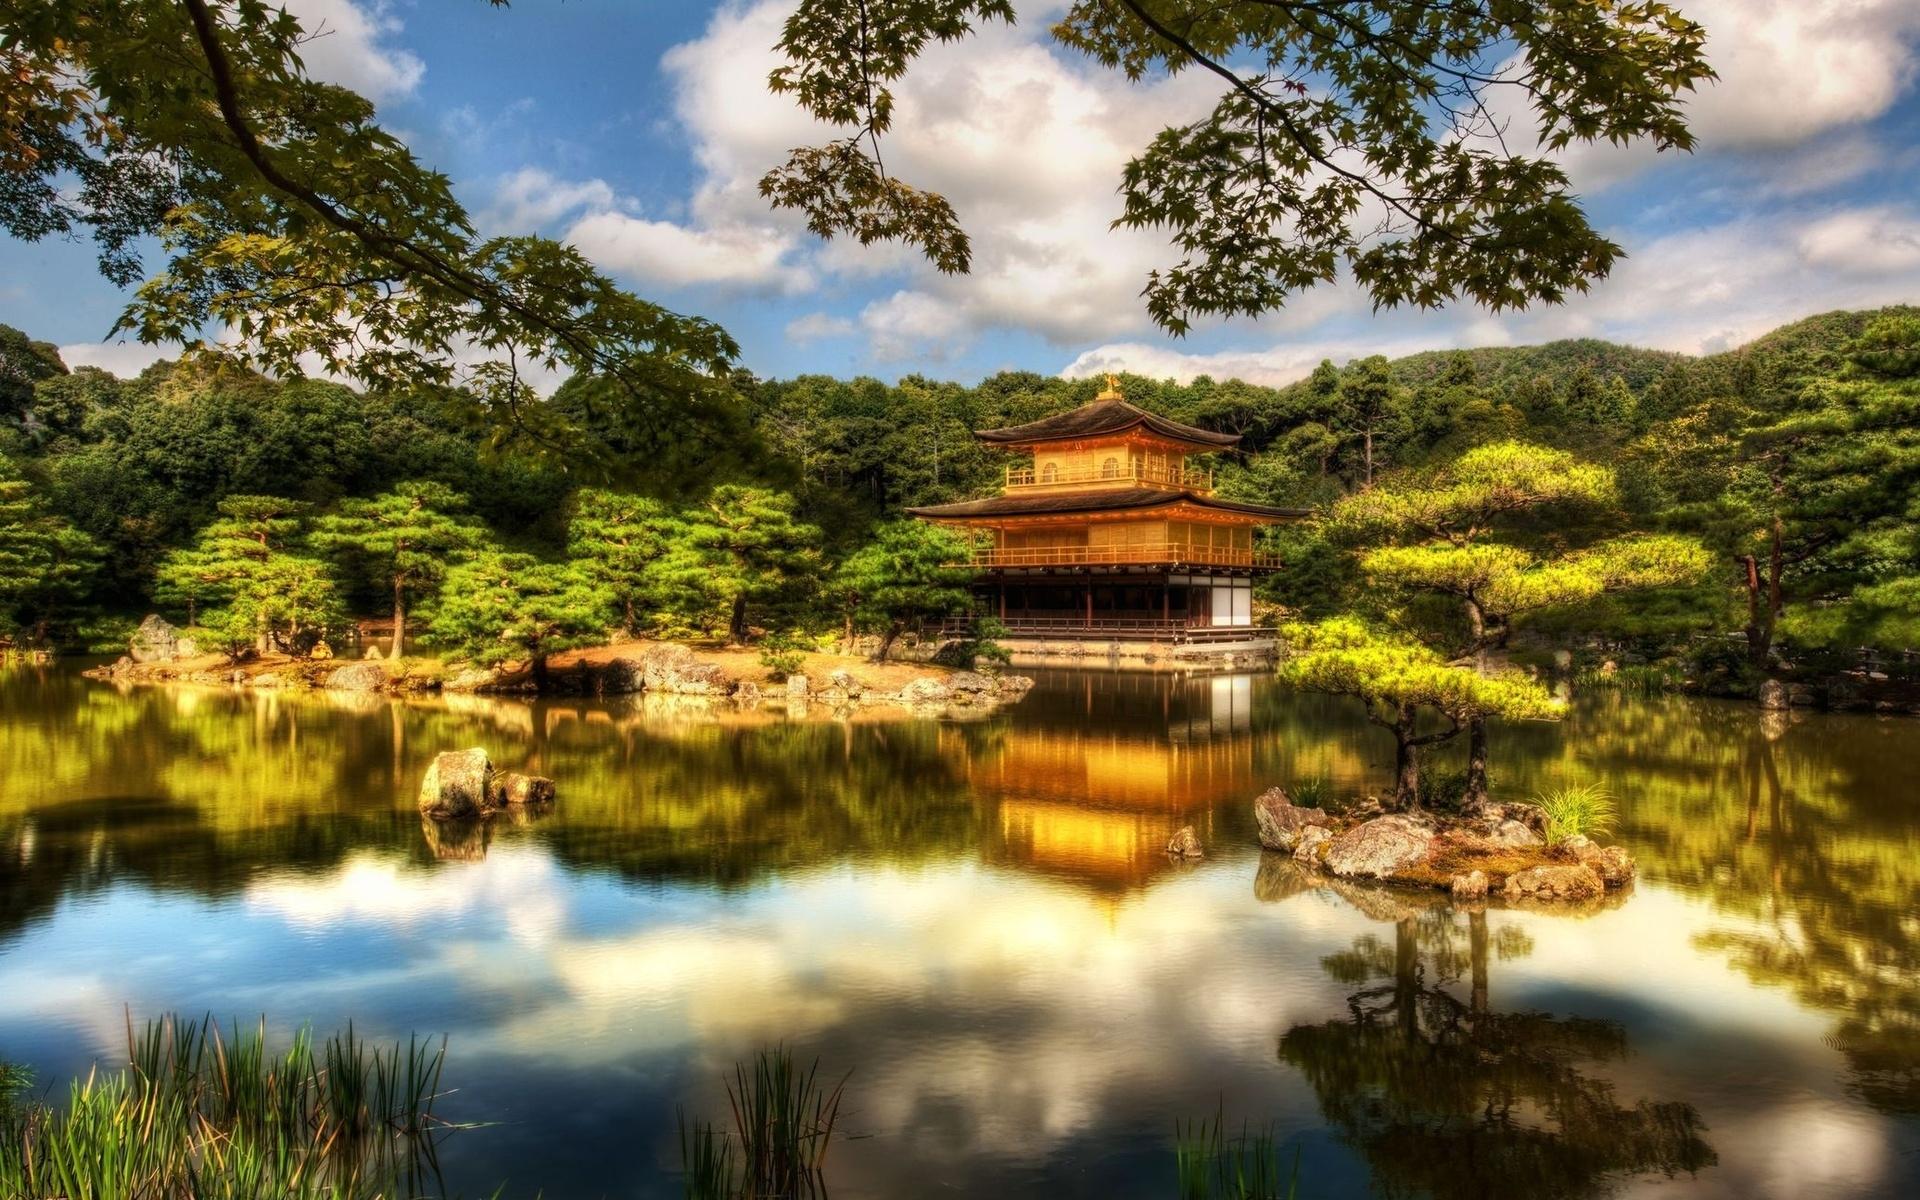 Ryoanji Zen Garden Japan Mirabell Gardens Austria